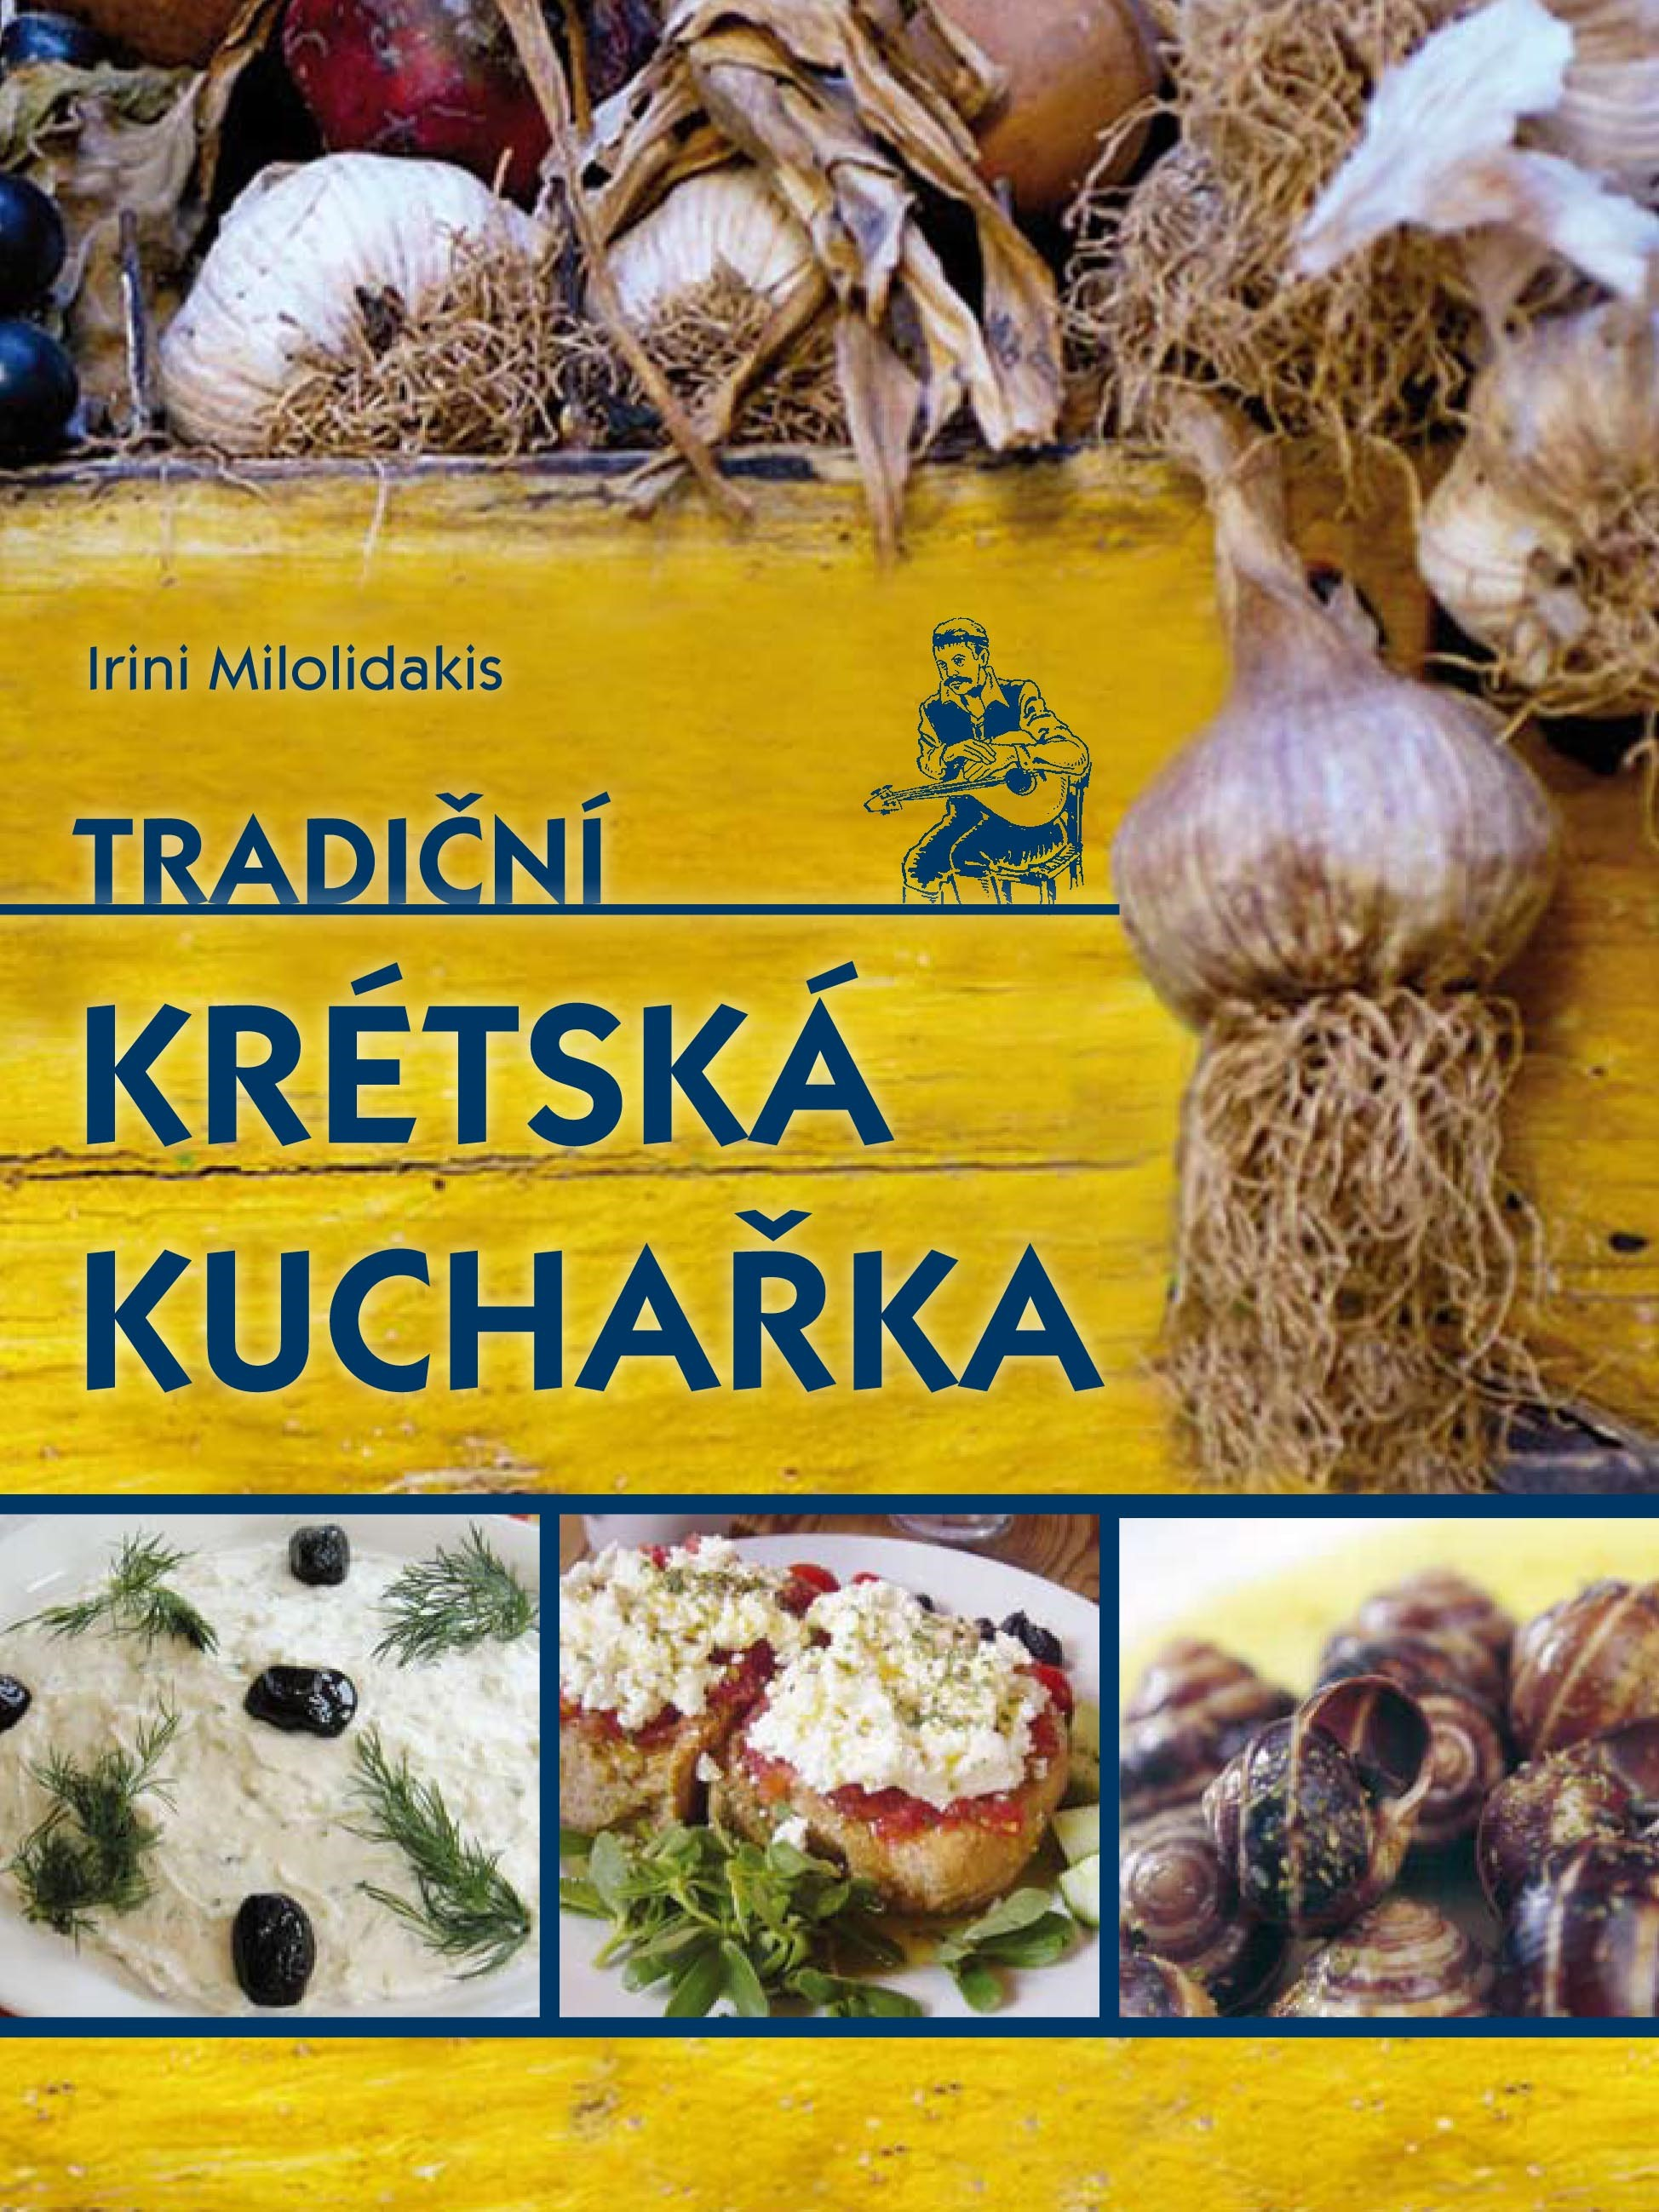 Tradiční krétská kuchařka | Irini Milolidakis